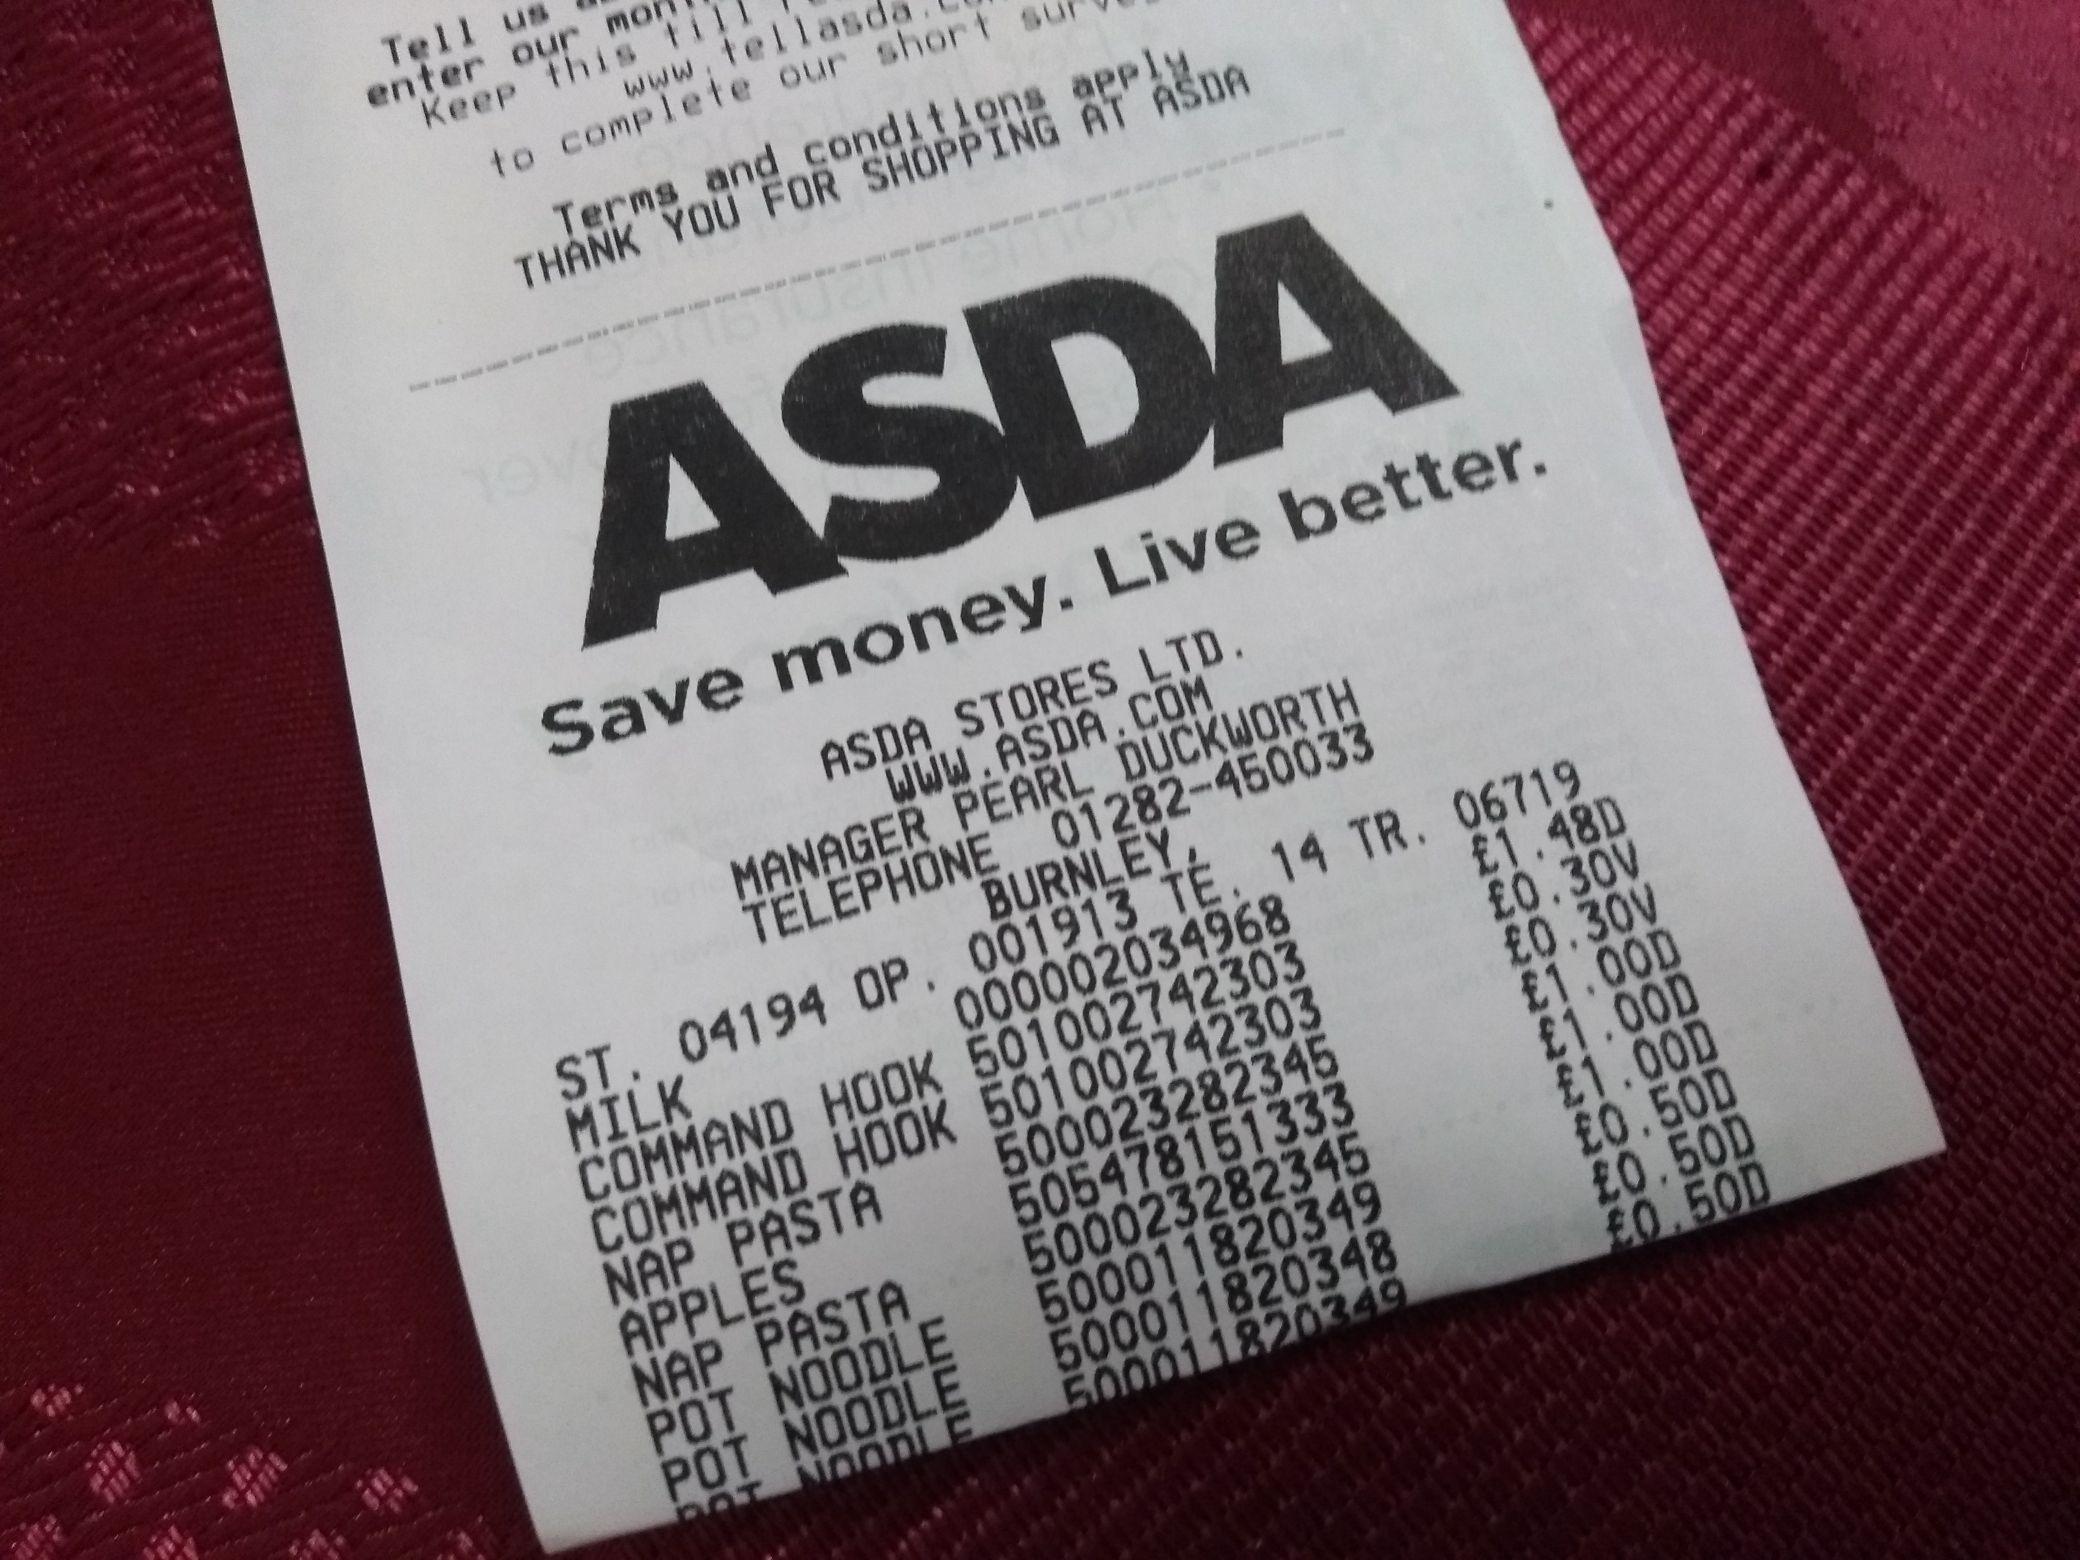 3M Command Damage-Free Medium Hooks - 30p instore @ Asda (Burnley)